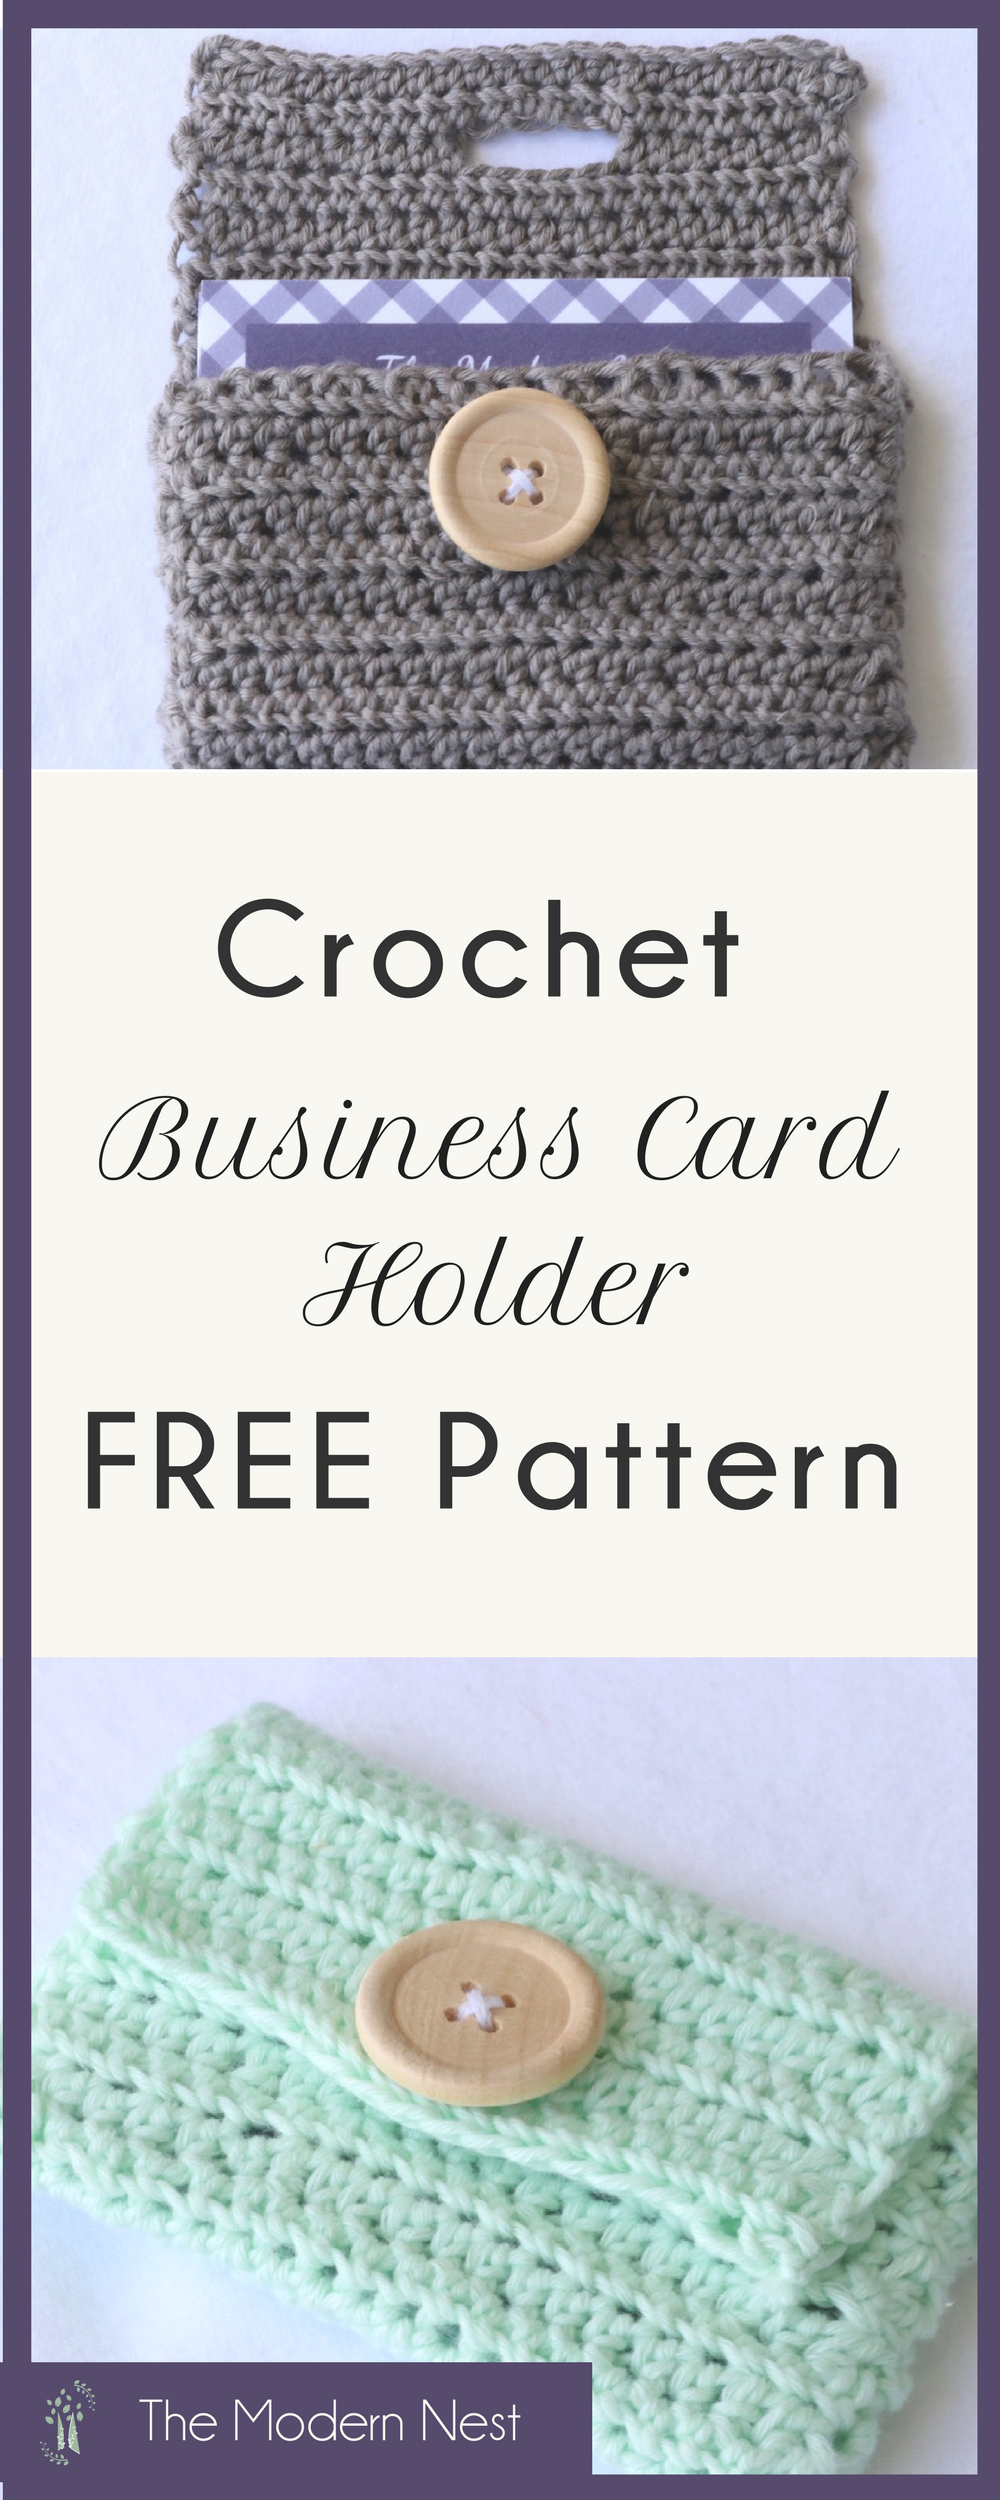 Business Card Holder Crochet Pattern   Ideas artesanales, Artesanal ...